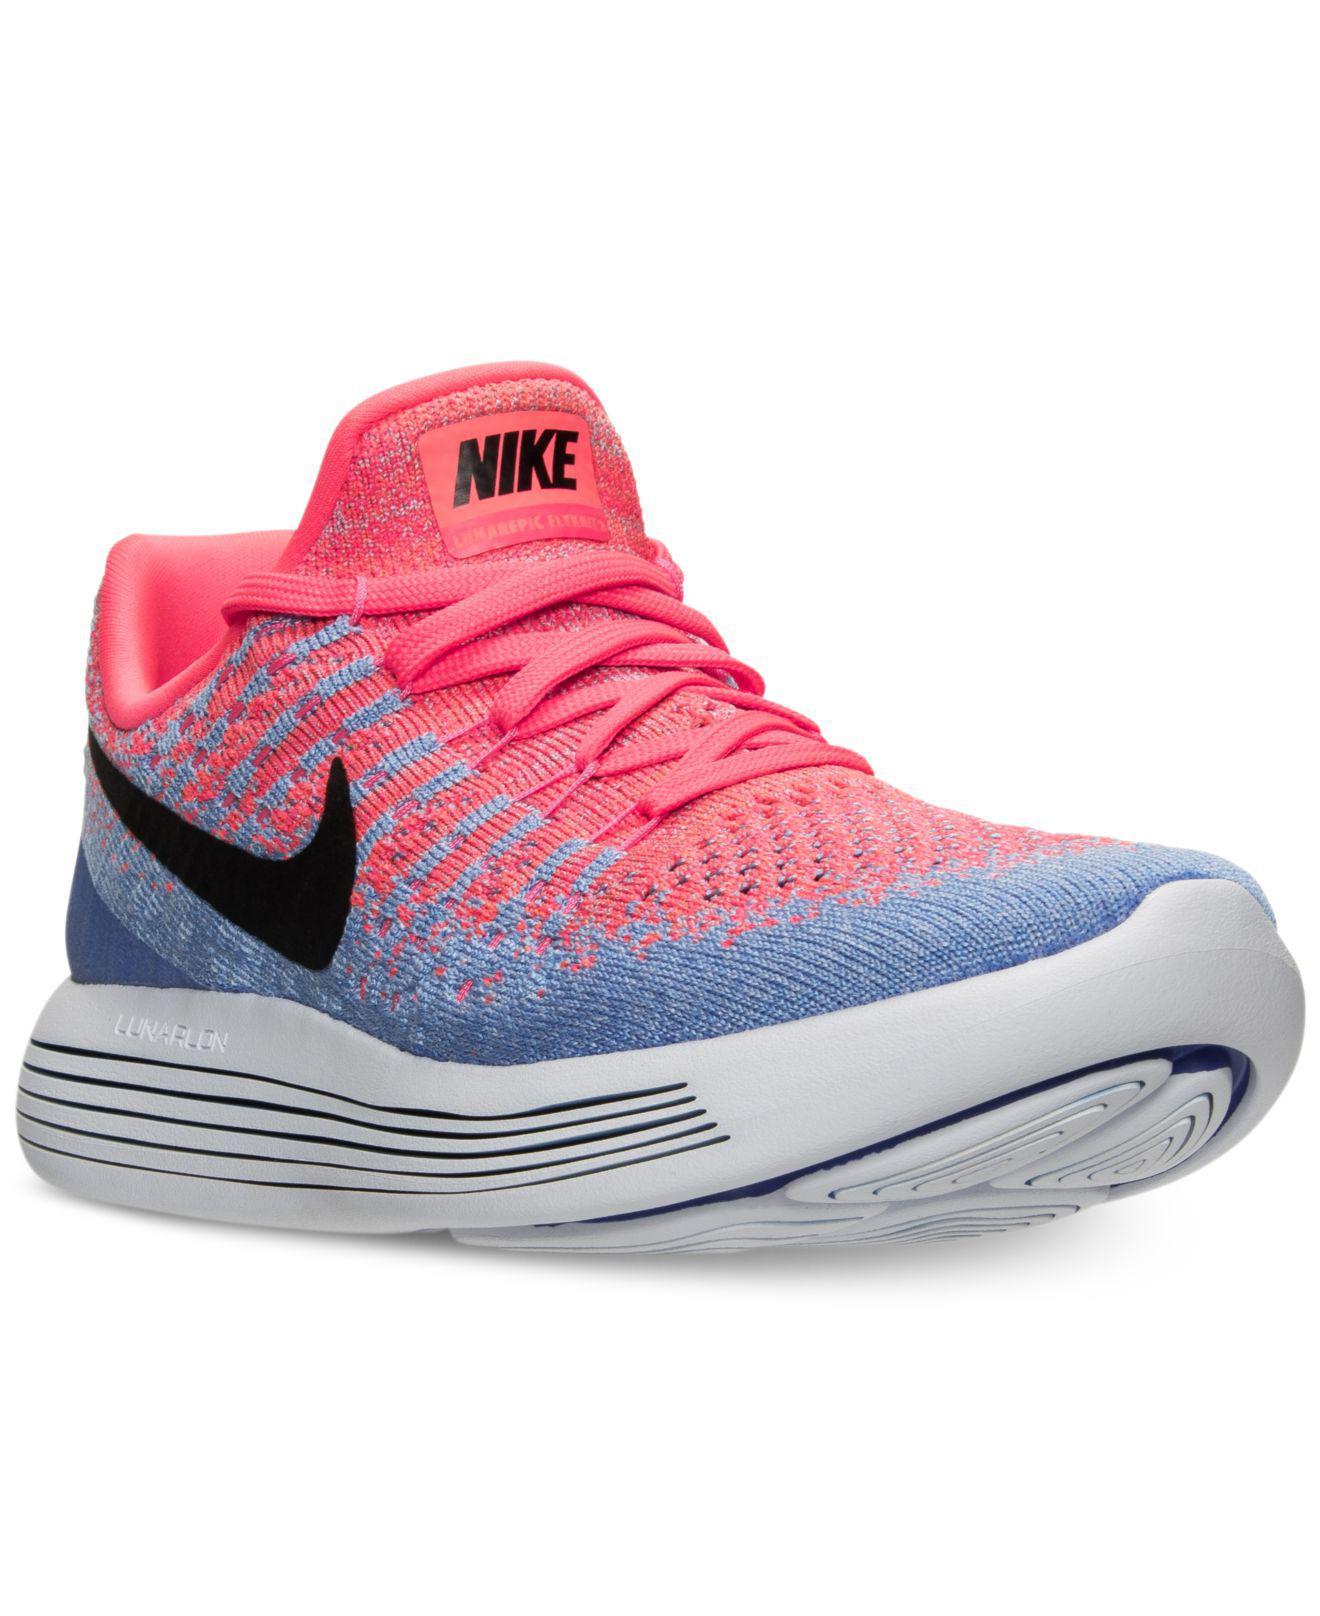 new arrival a1197 f6061 Lyst - Nike Women's Lunarepic Low Flyknit 2 Running Sneakers ...